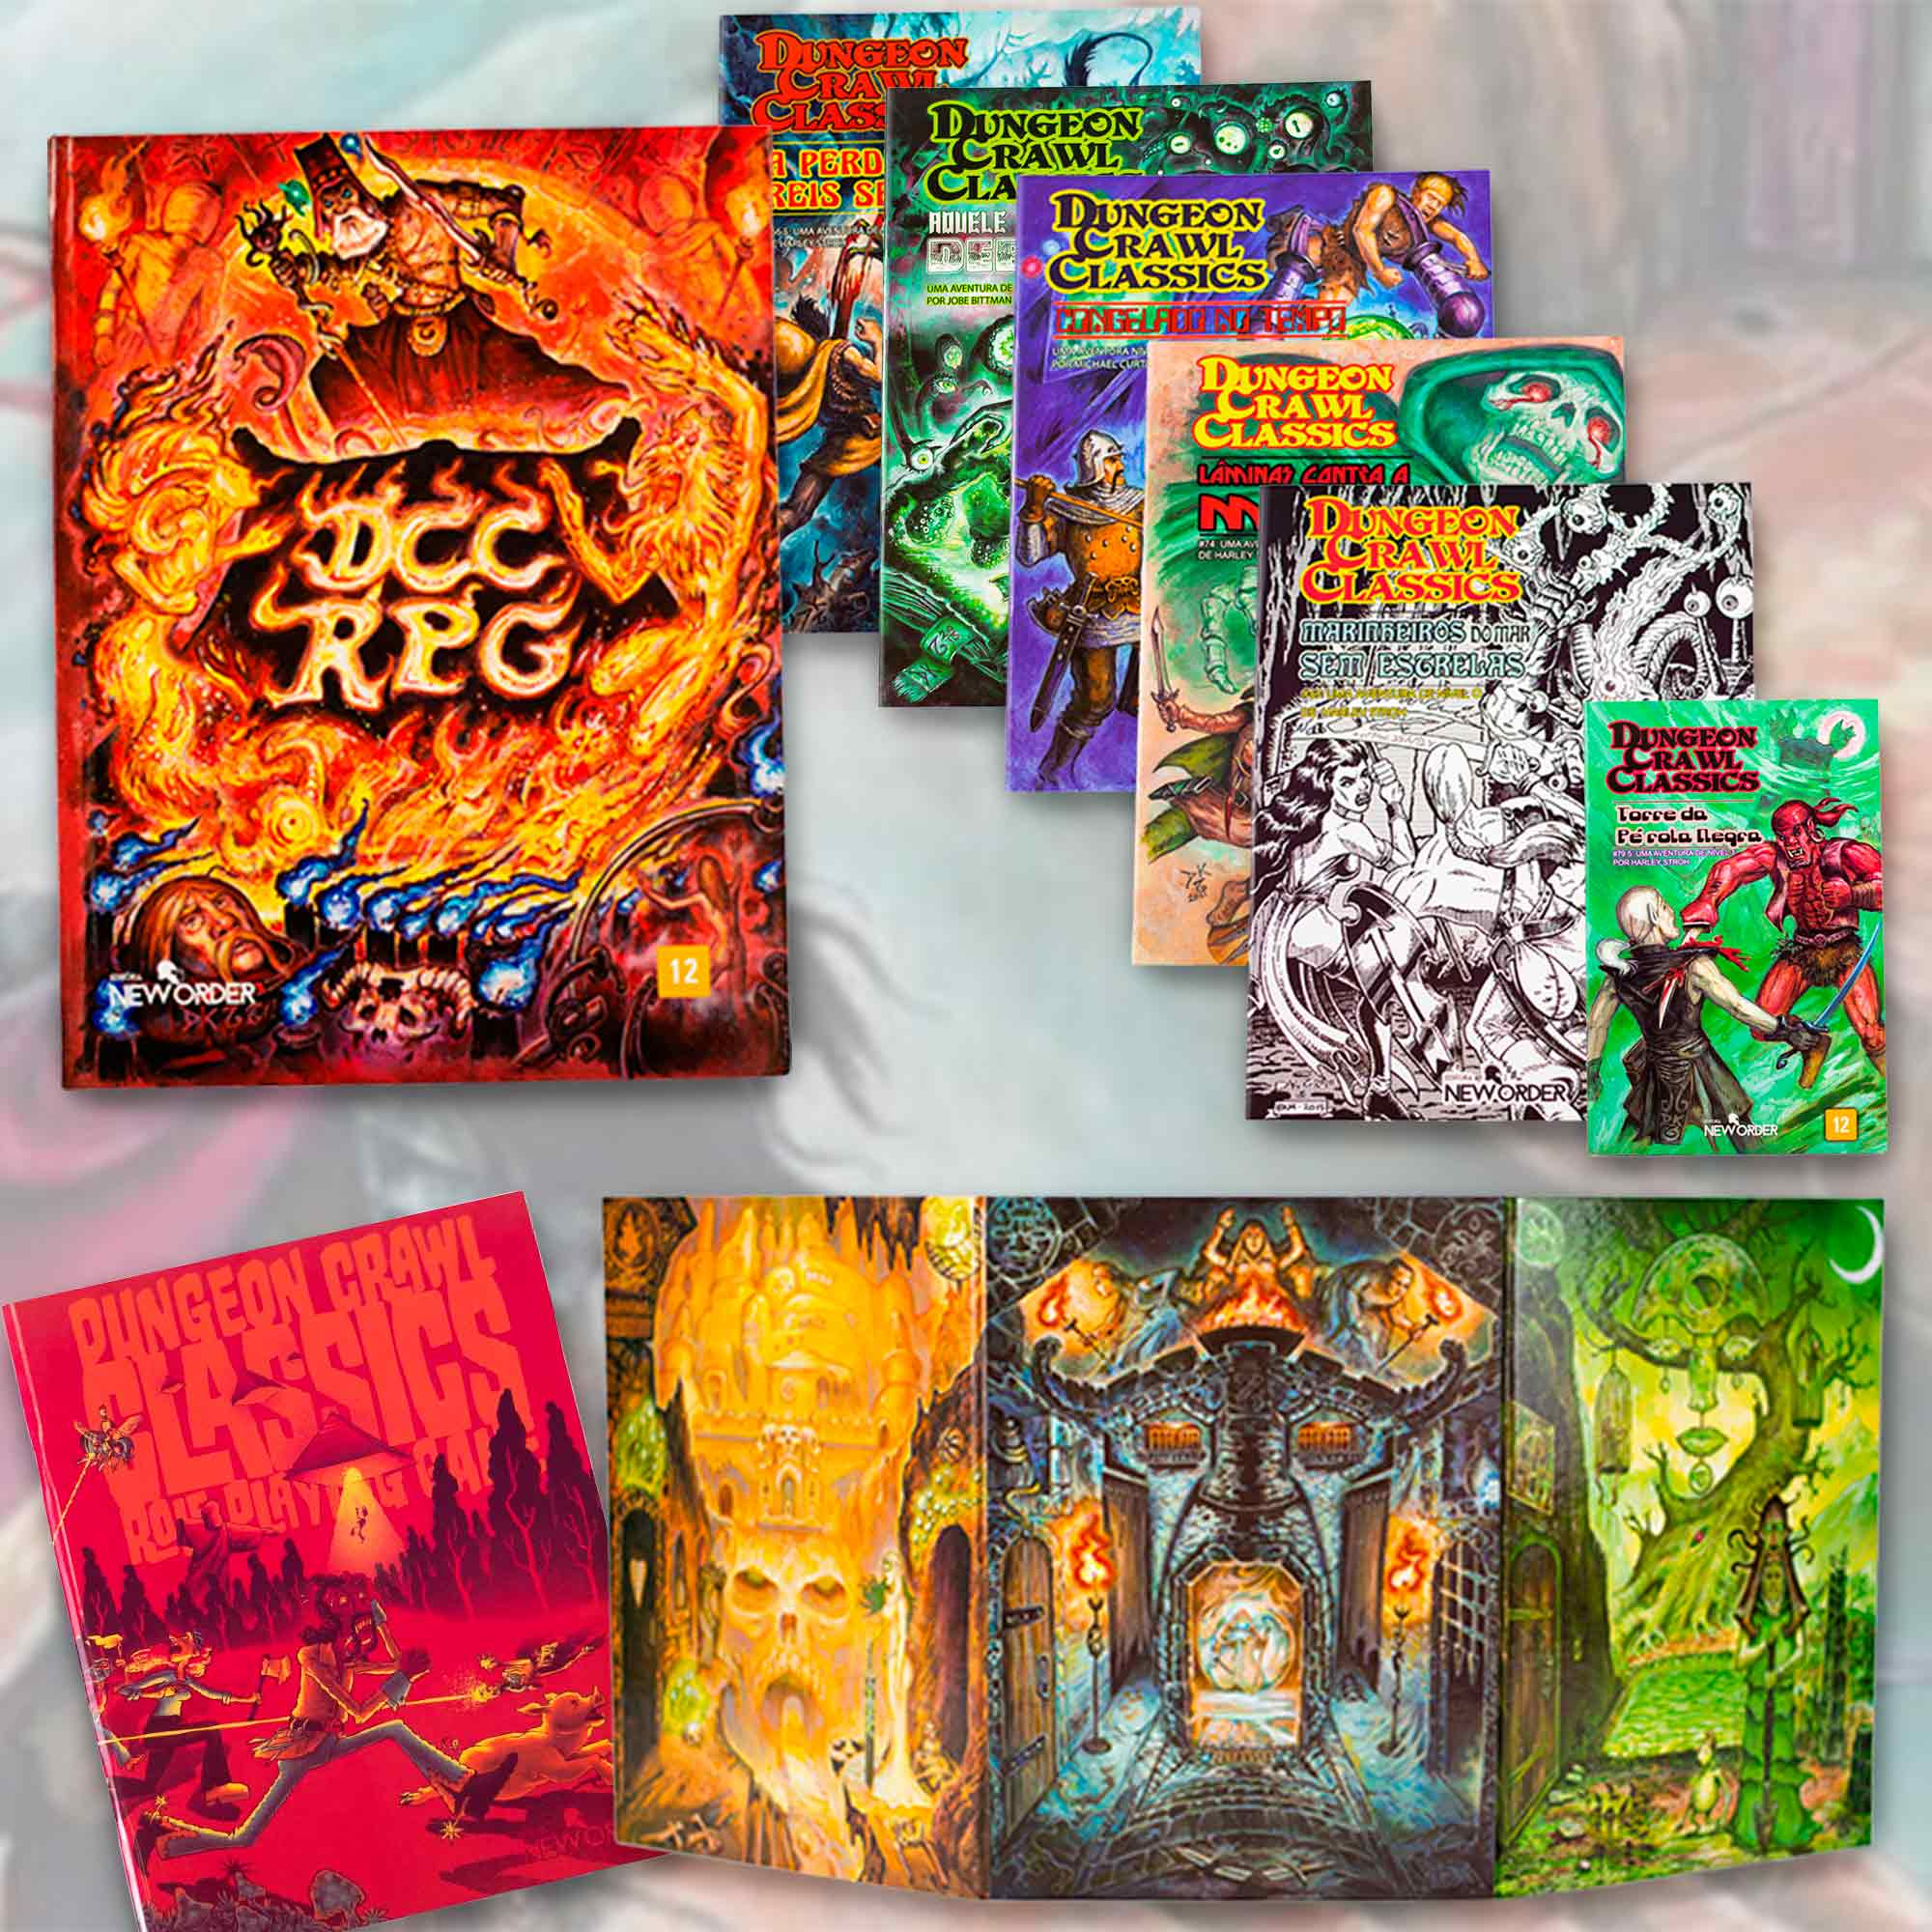 Kit DCC RPG